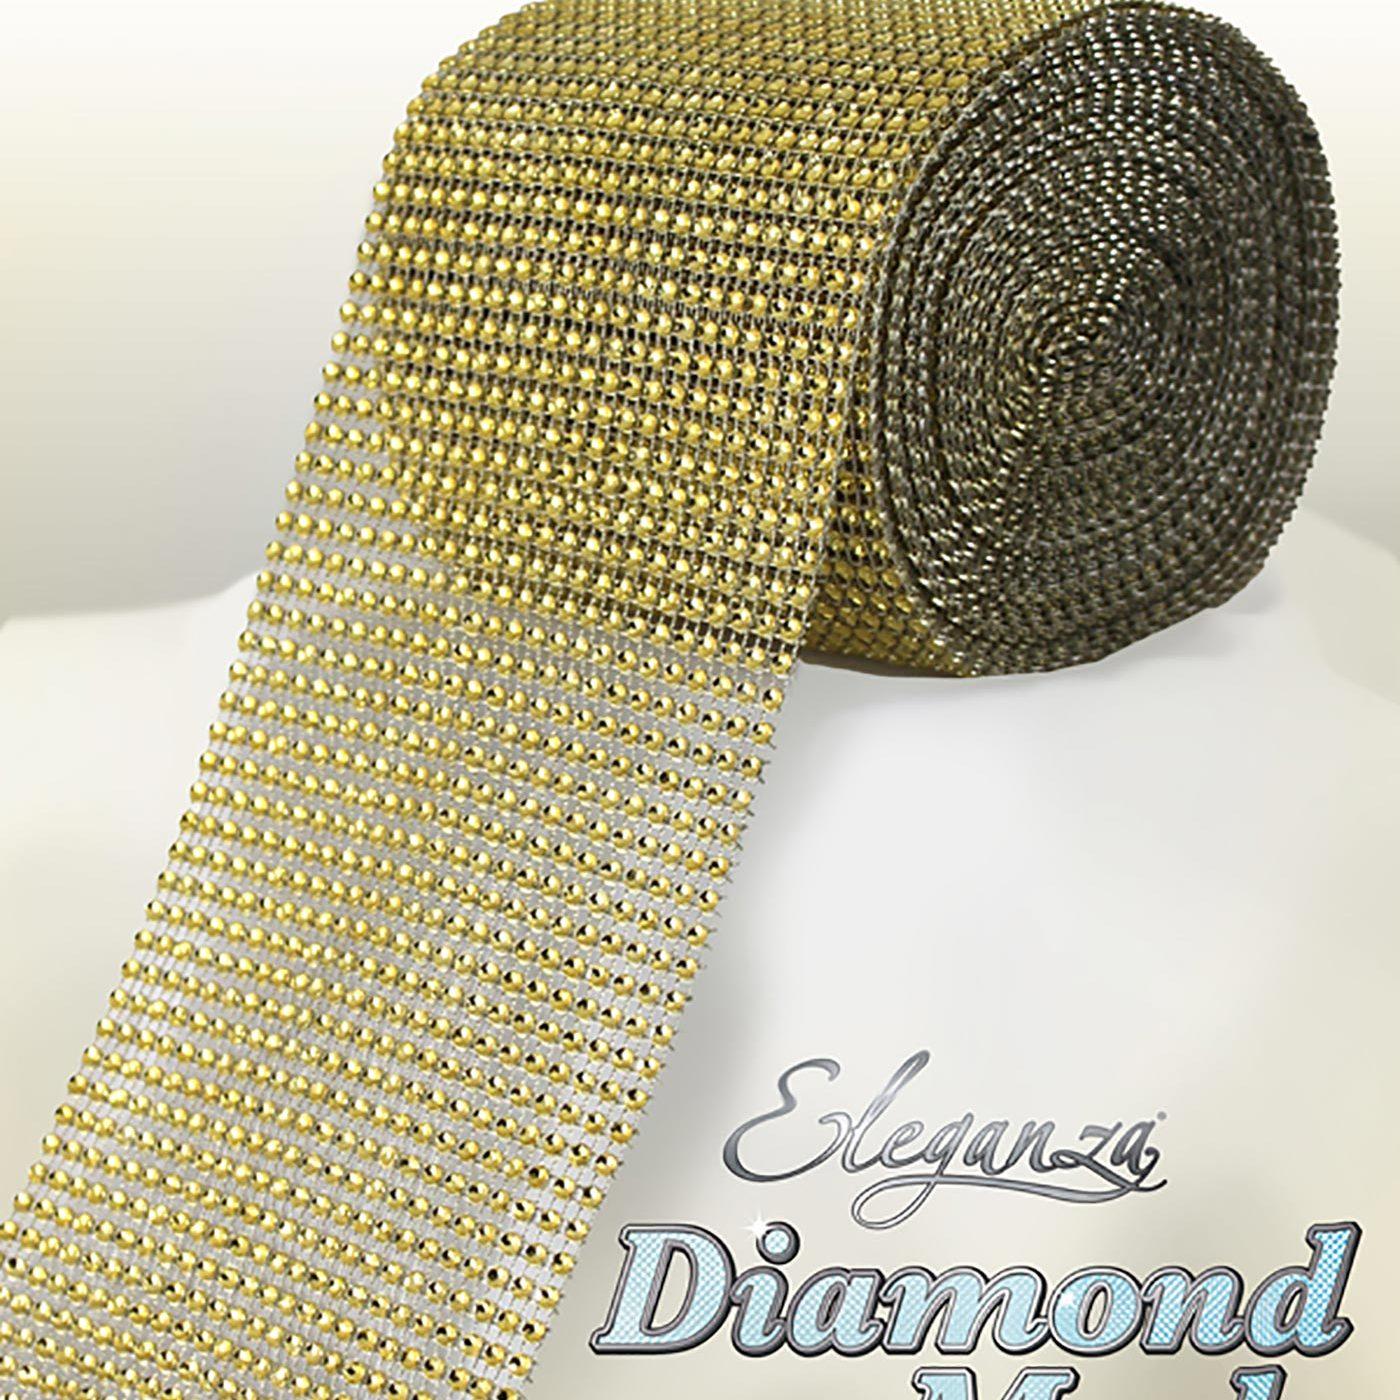 Eleganza Diamond Mesh 12cm x 9m Gold